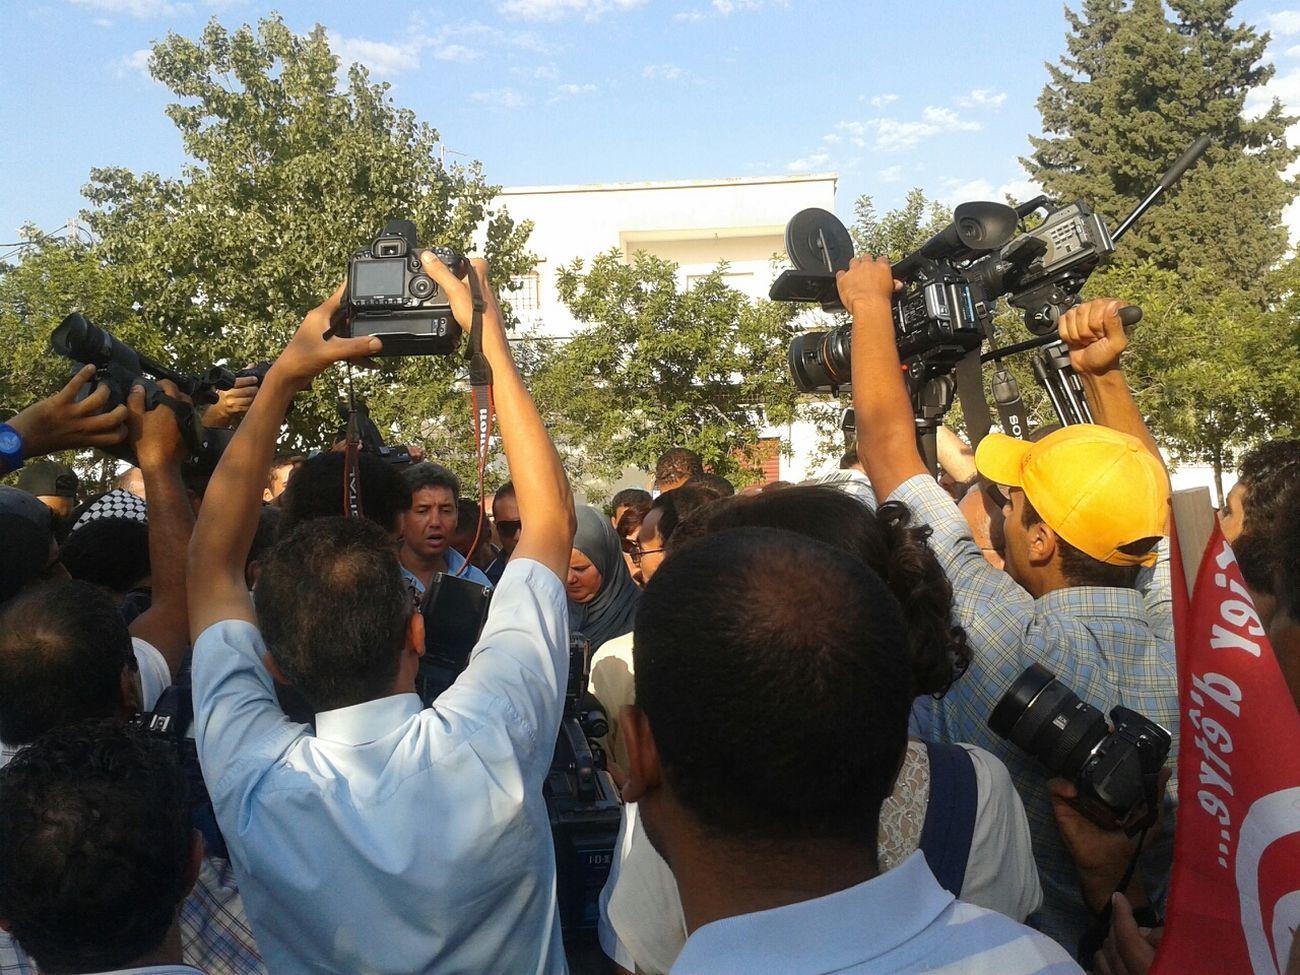 haut les mains Brahmi Ra7il #tunisia #degage #ta7iatounes Citeghazela